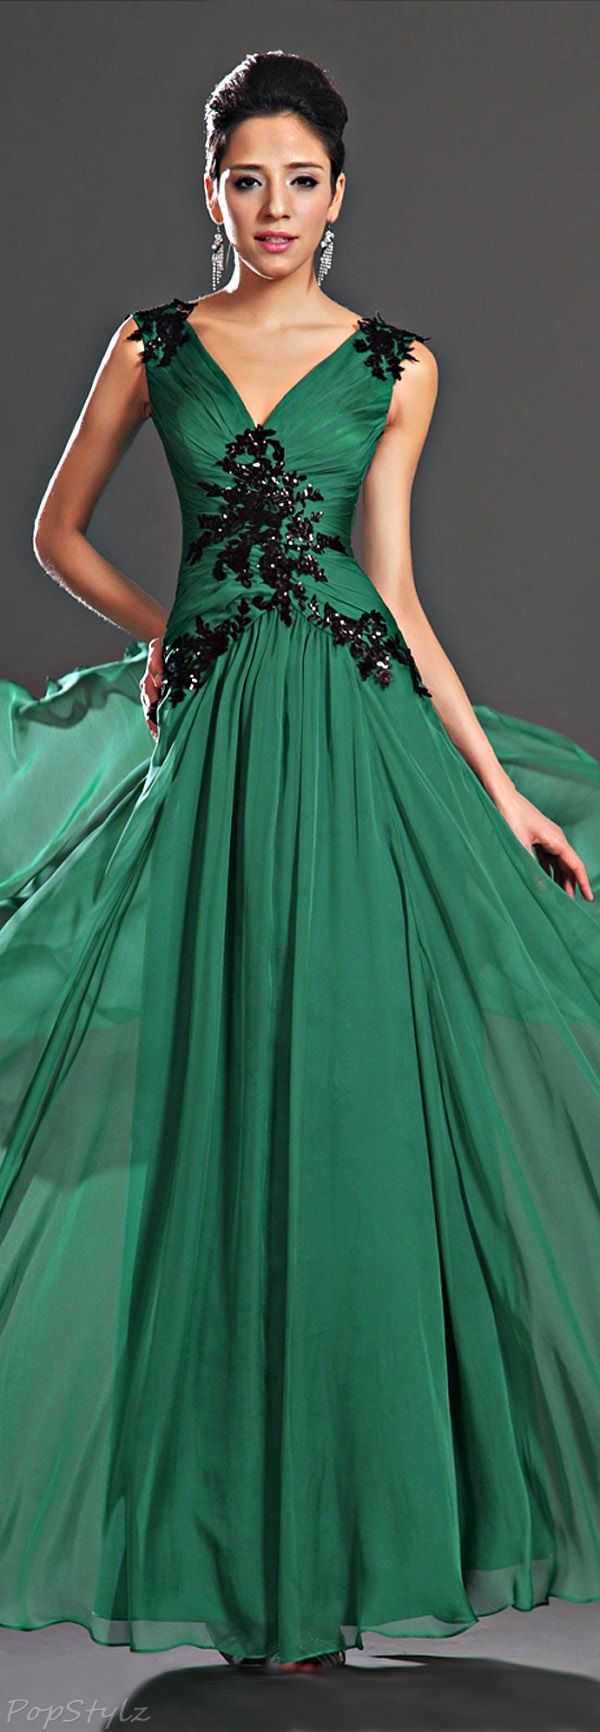 evening gowns dresses melbourne